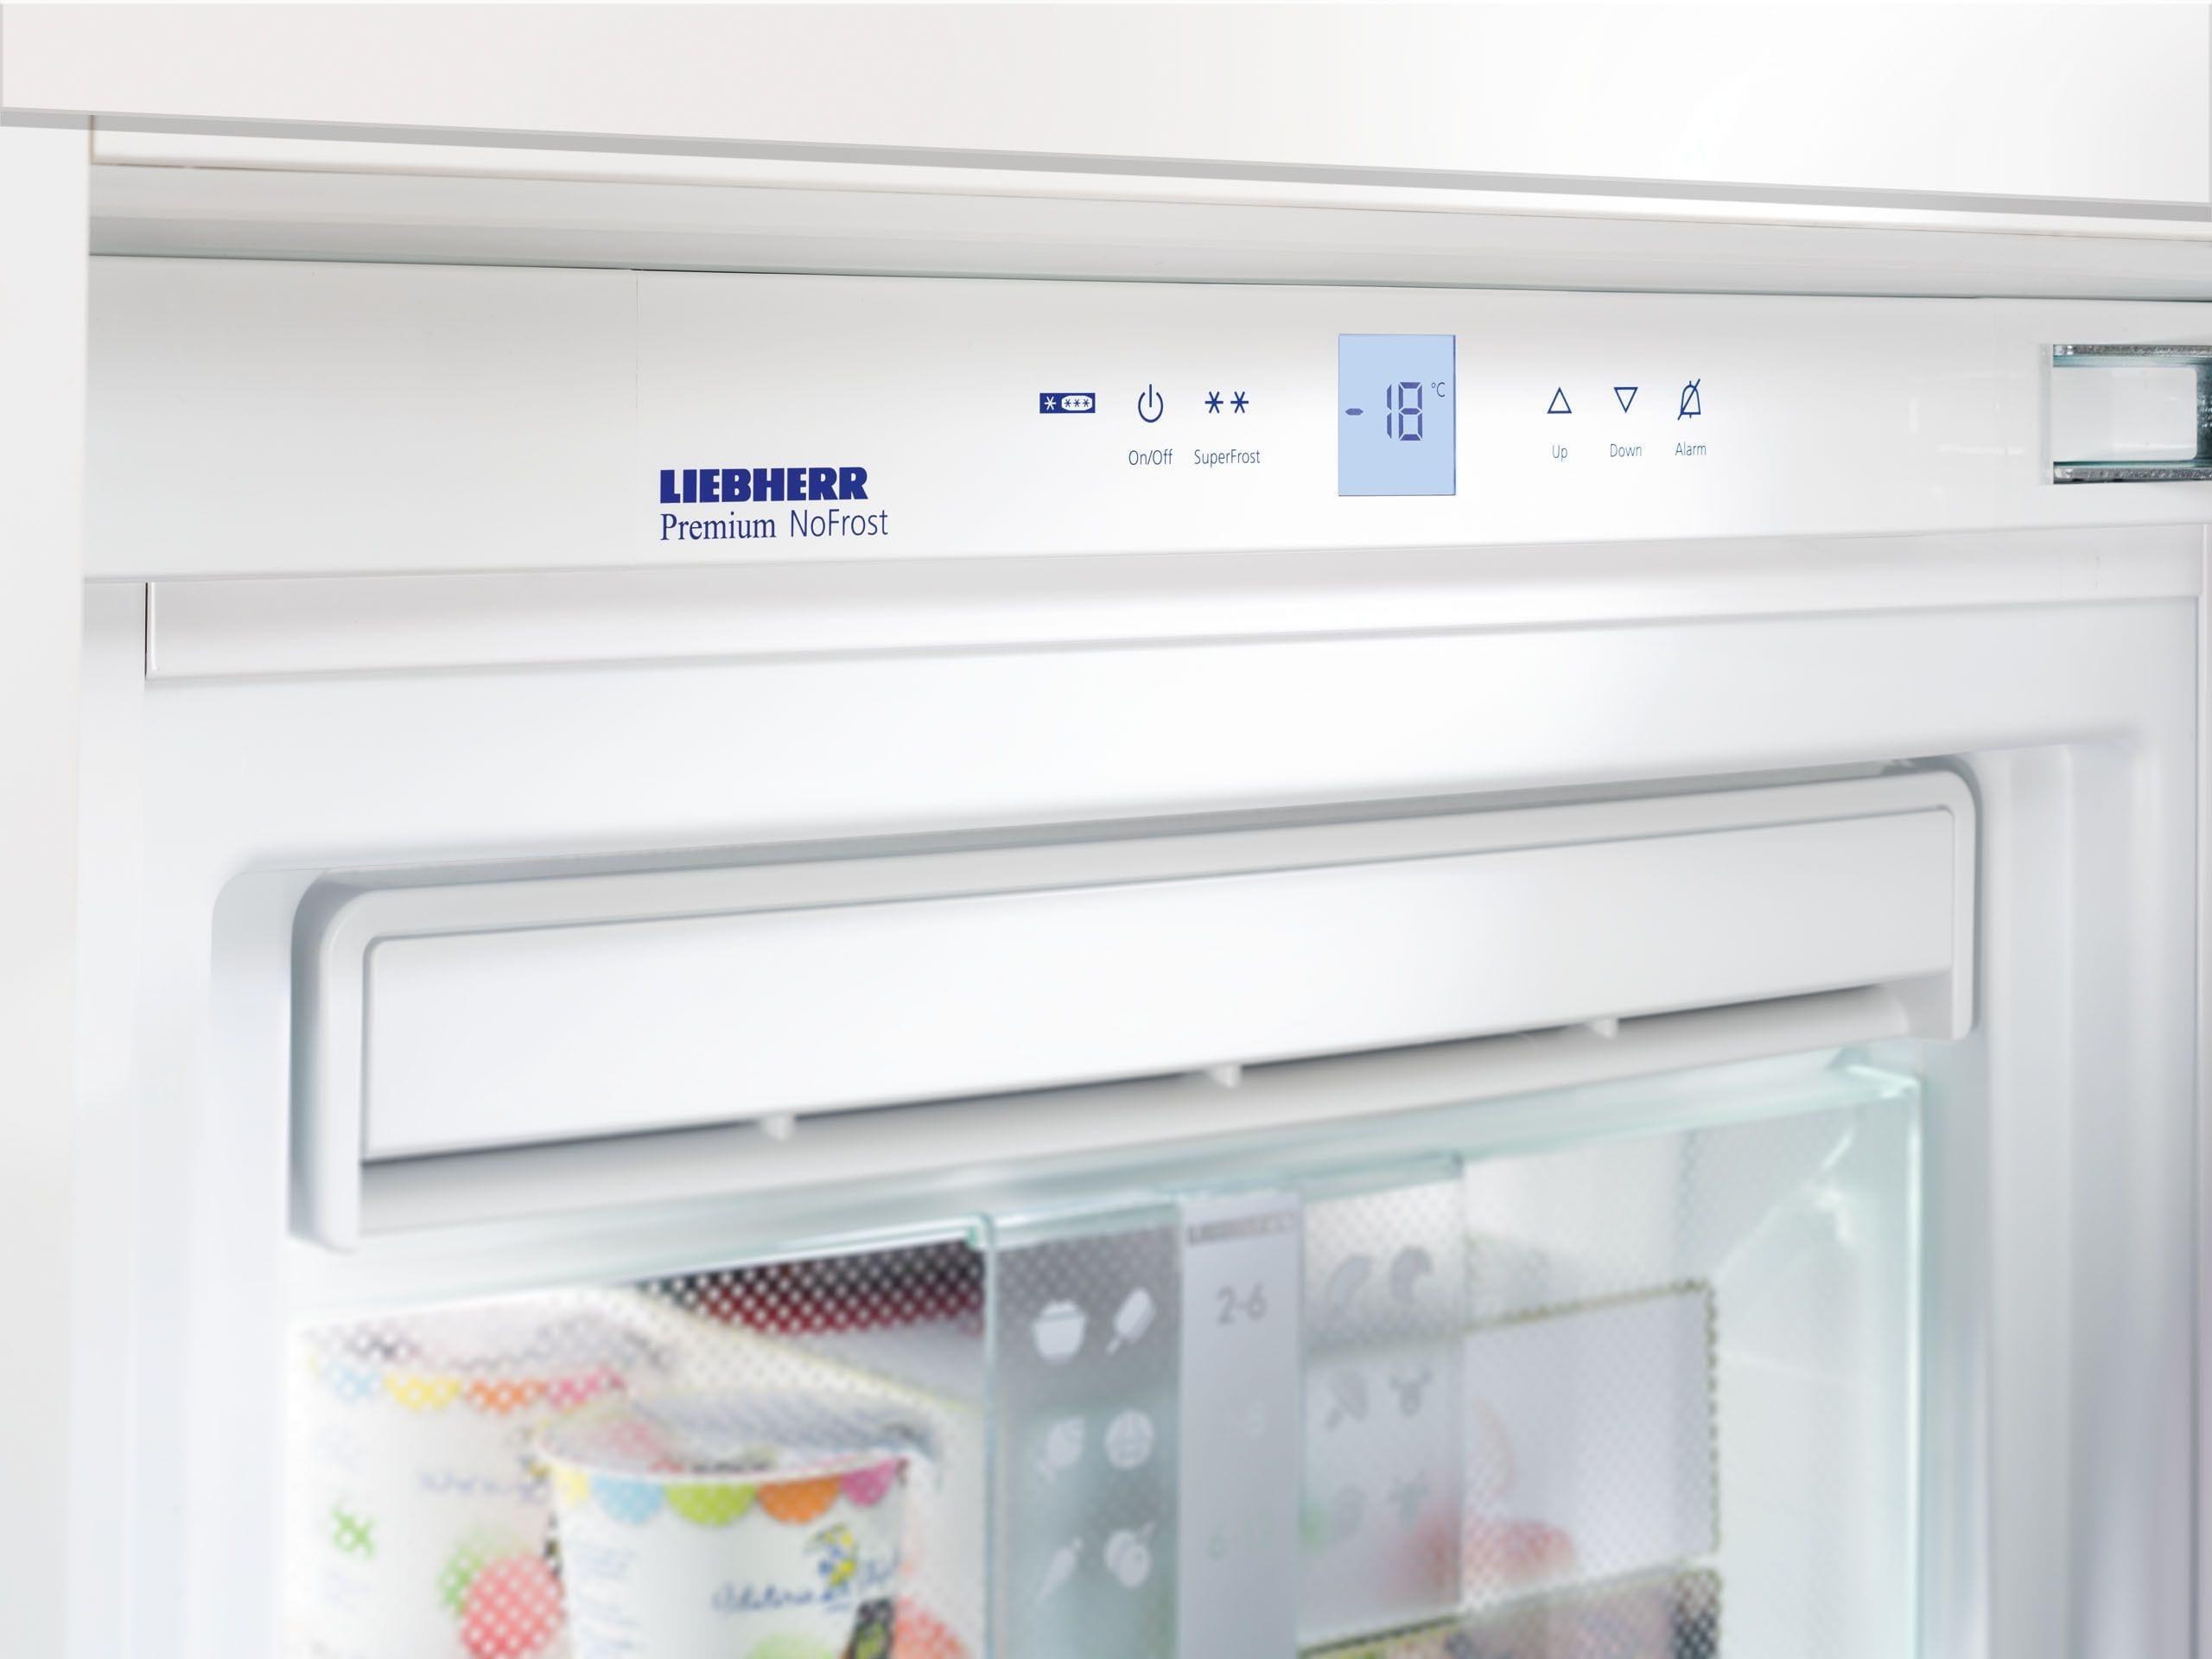 Perch la temperatura ideale del congelatore 18 c freshmag - Temperatura freezer casa ...